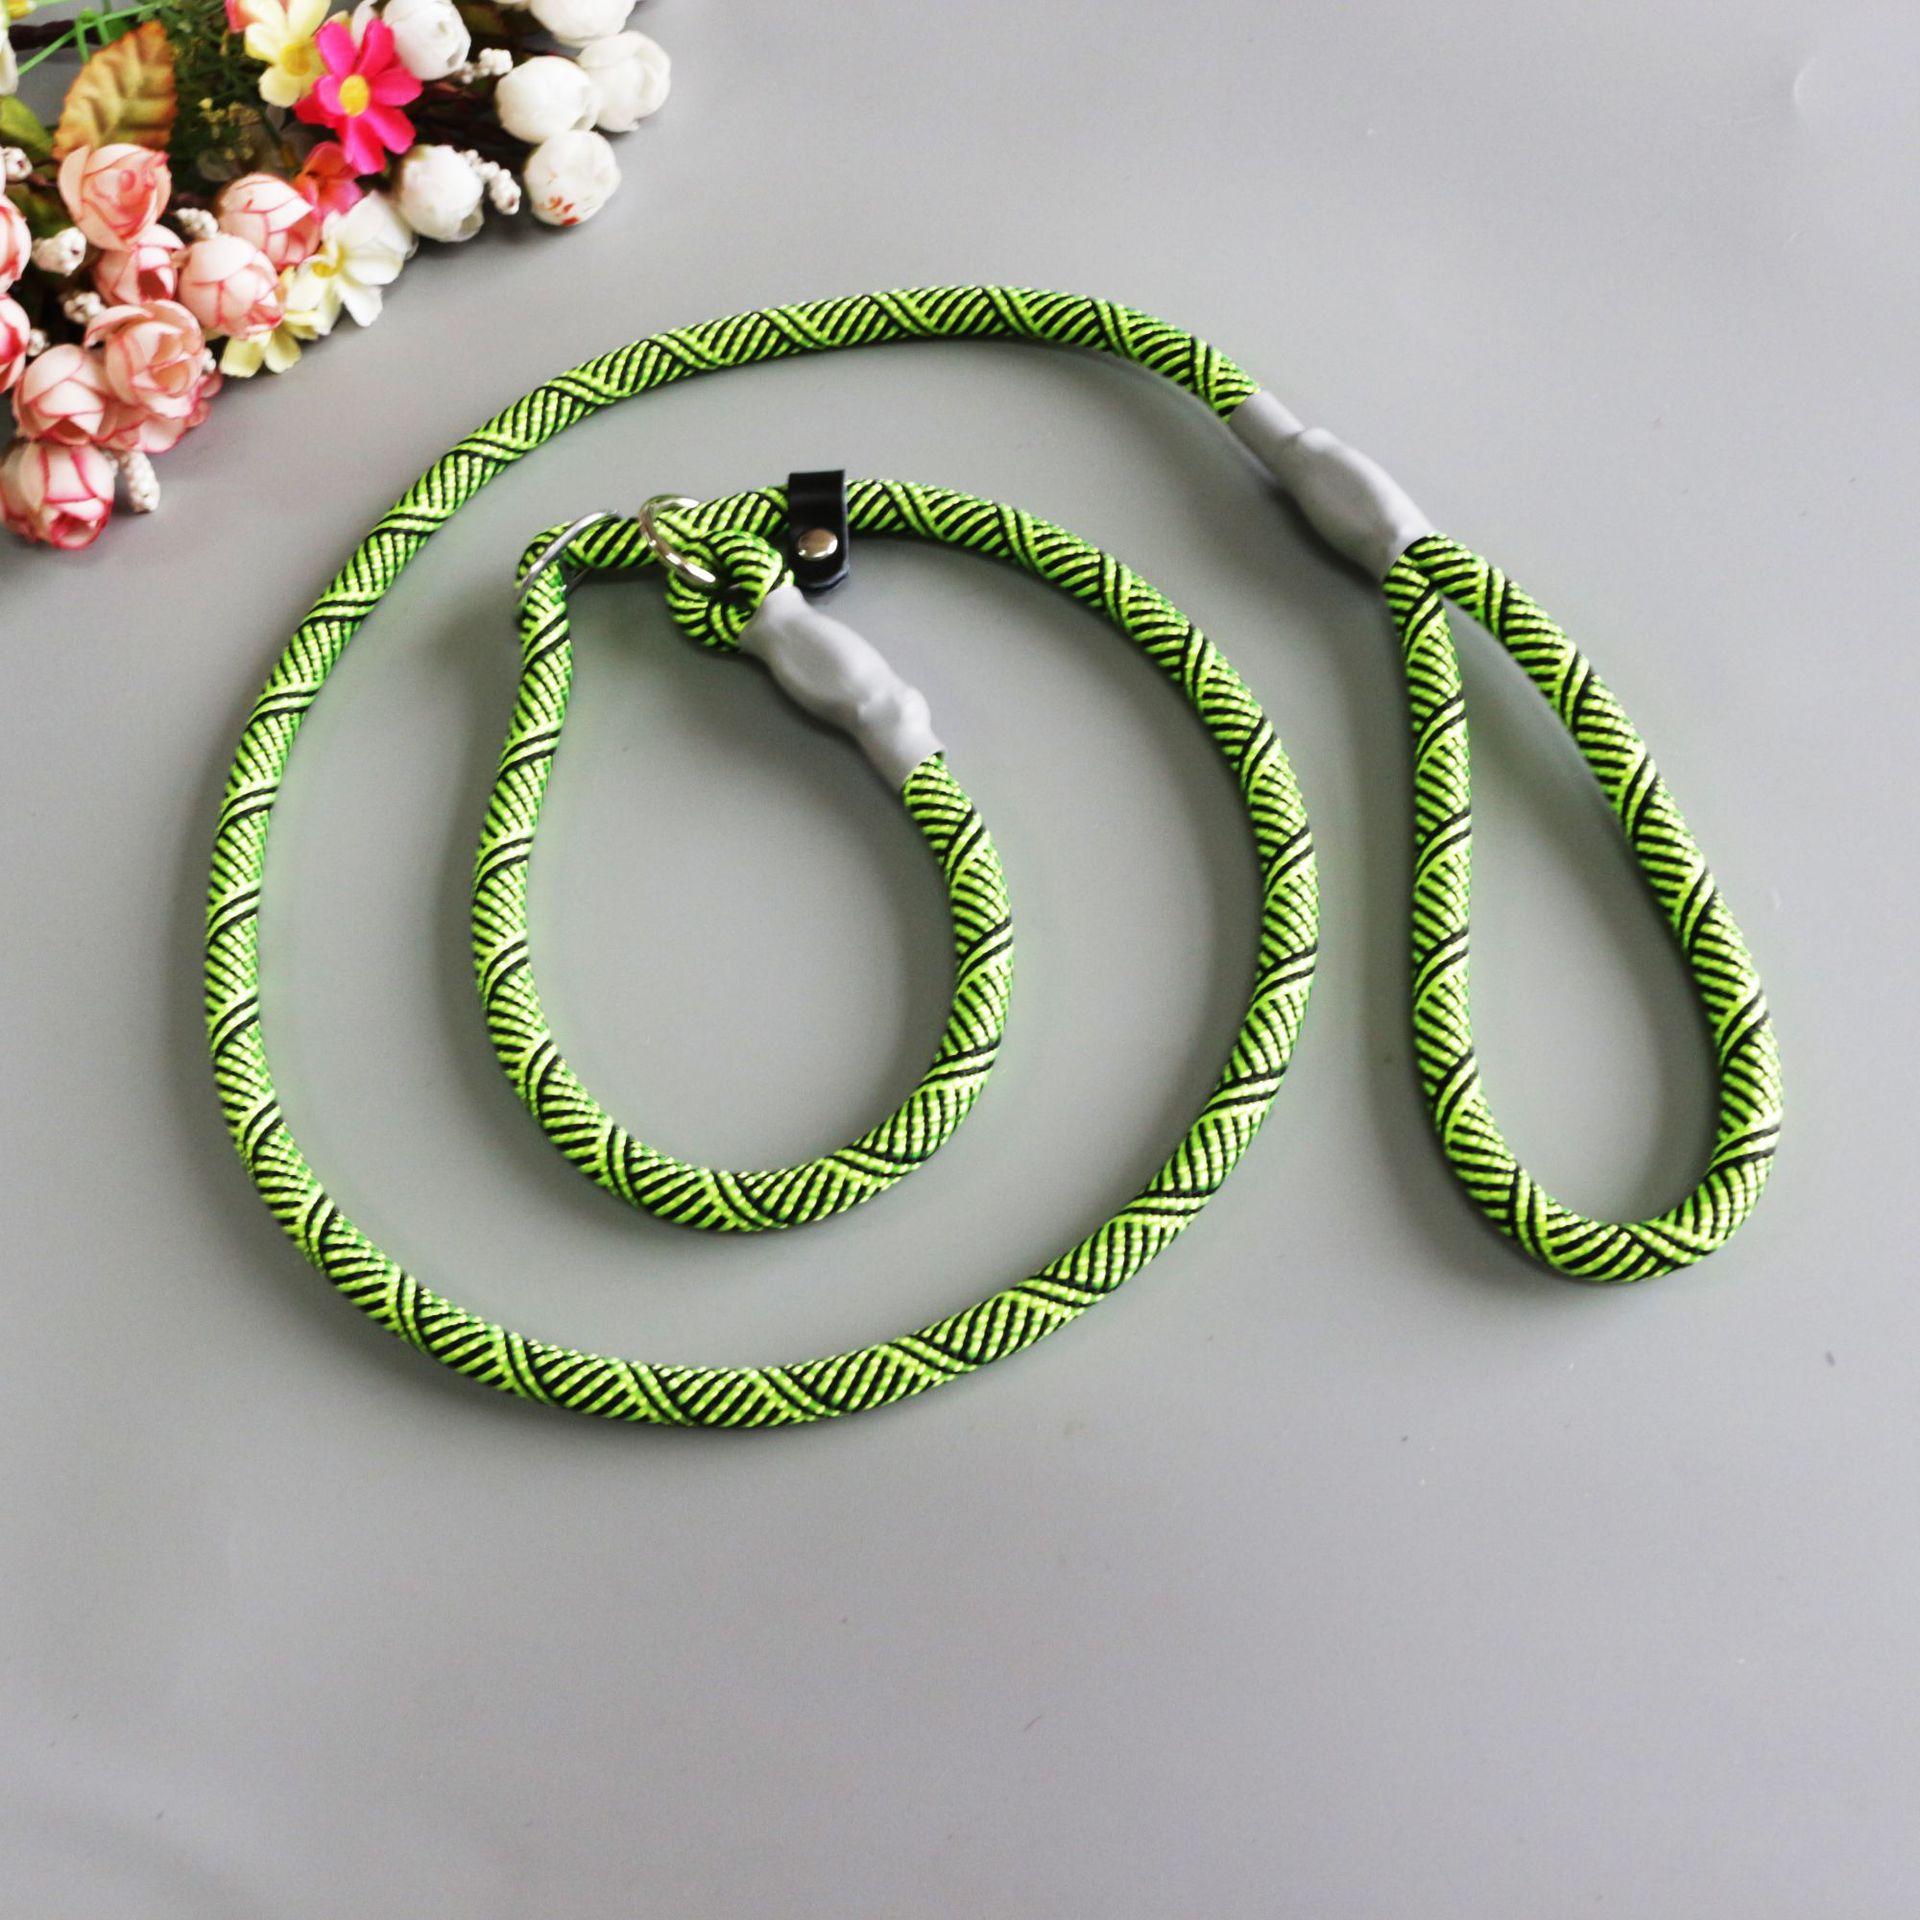 Pet Supplies Wholesale Dog Pendant Pet Traction Rope Aluminum Sheath P Pendant Twill Anti Le Hand Holding Rope Manufacturers Dir